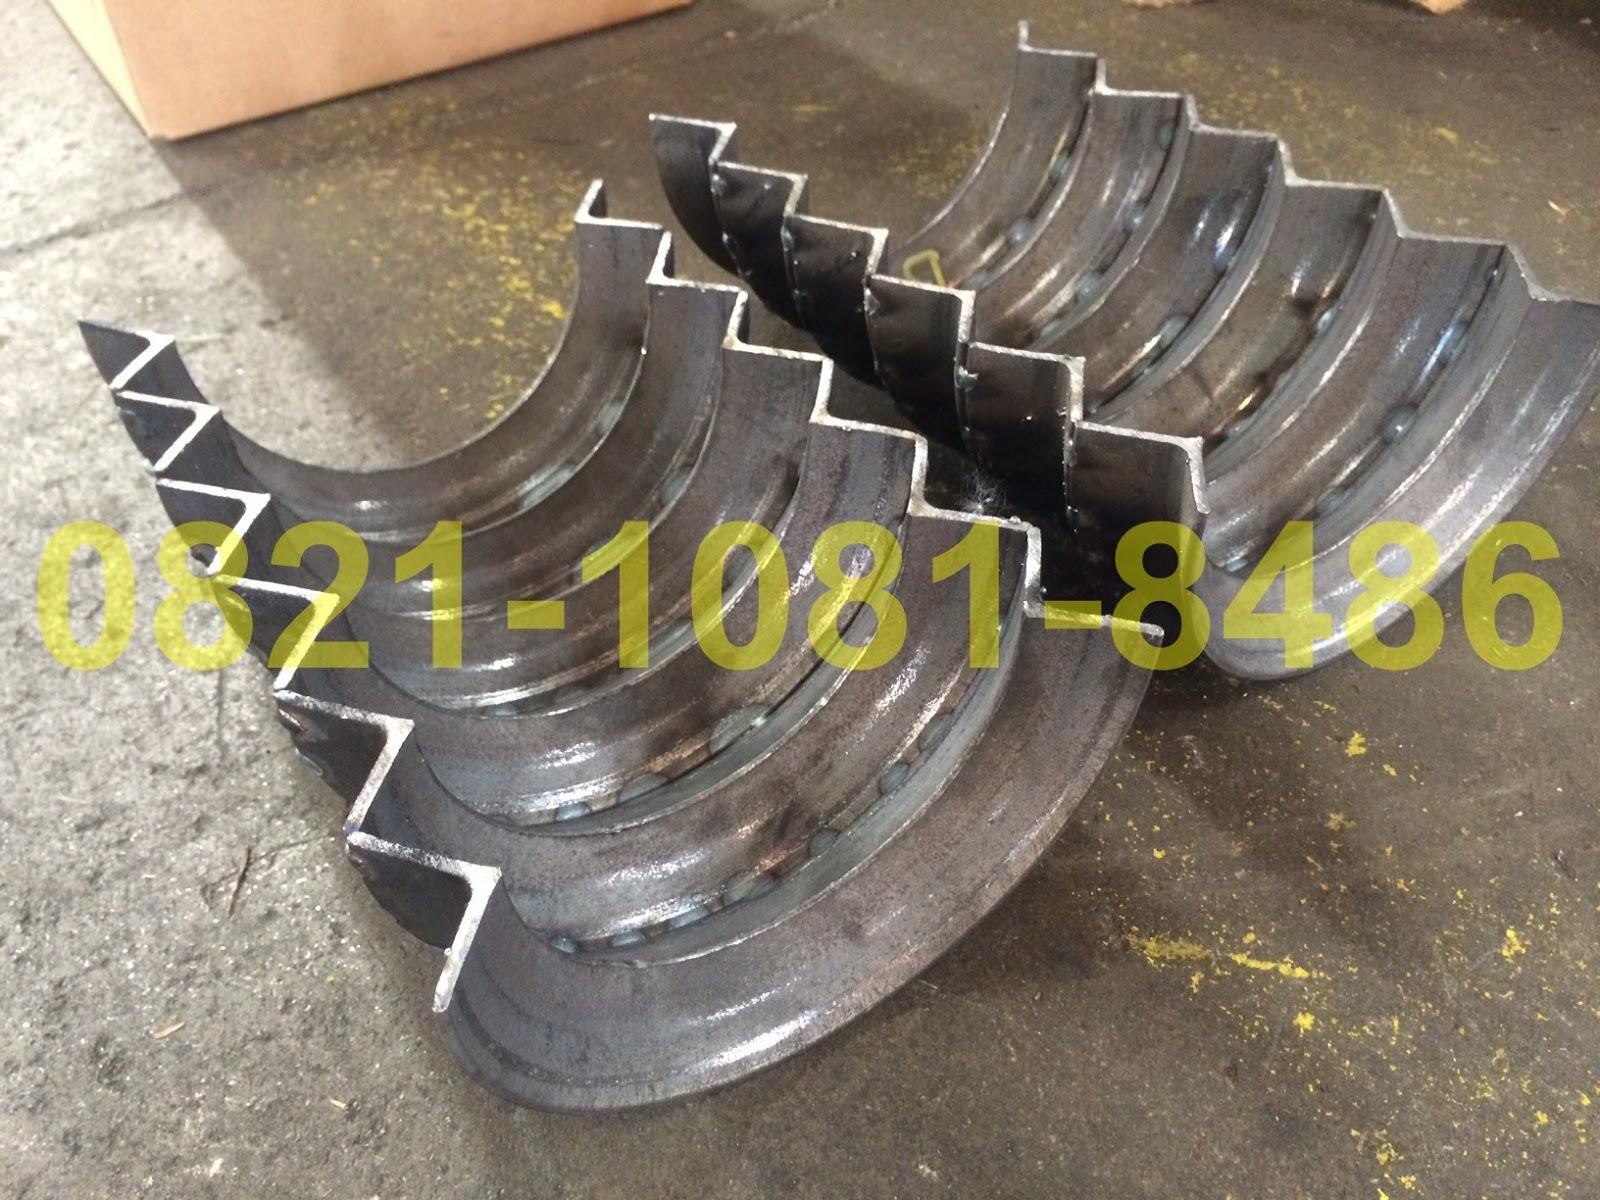 Jasa Roll Besi Siku Wilayah Purwakarta Dan Sekitarnya Tangga Lipat Aluminium Krisbow 13m 6 Step Kw0102783